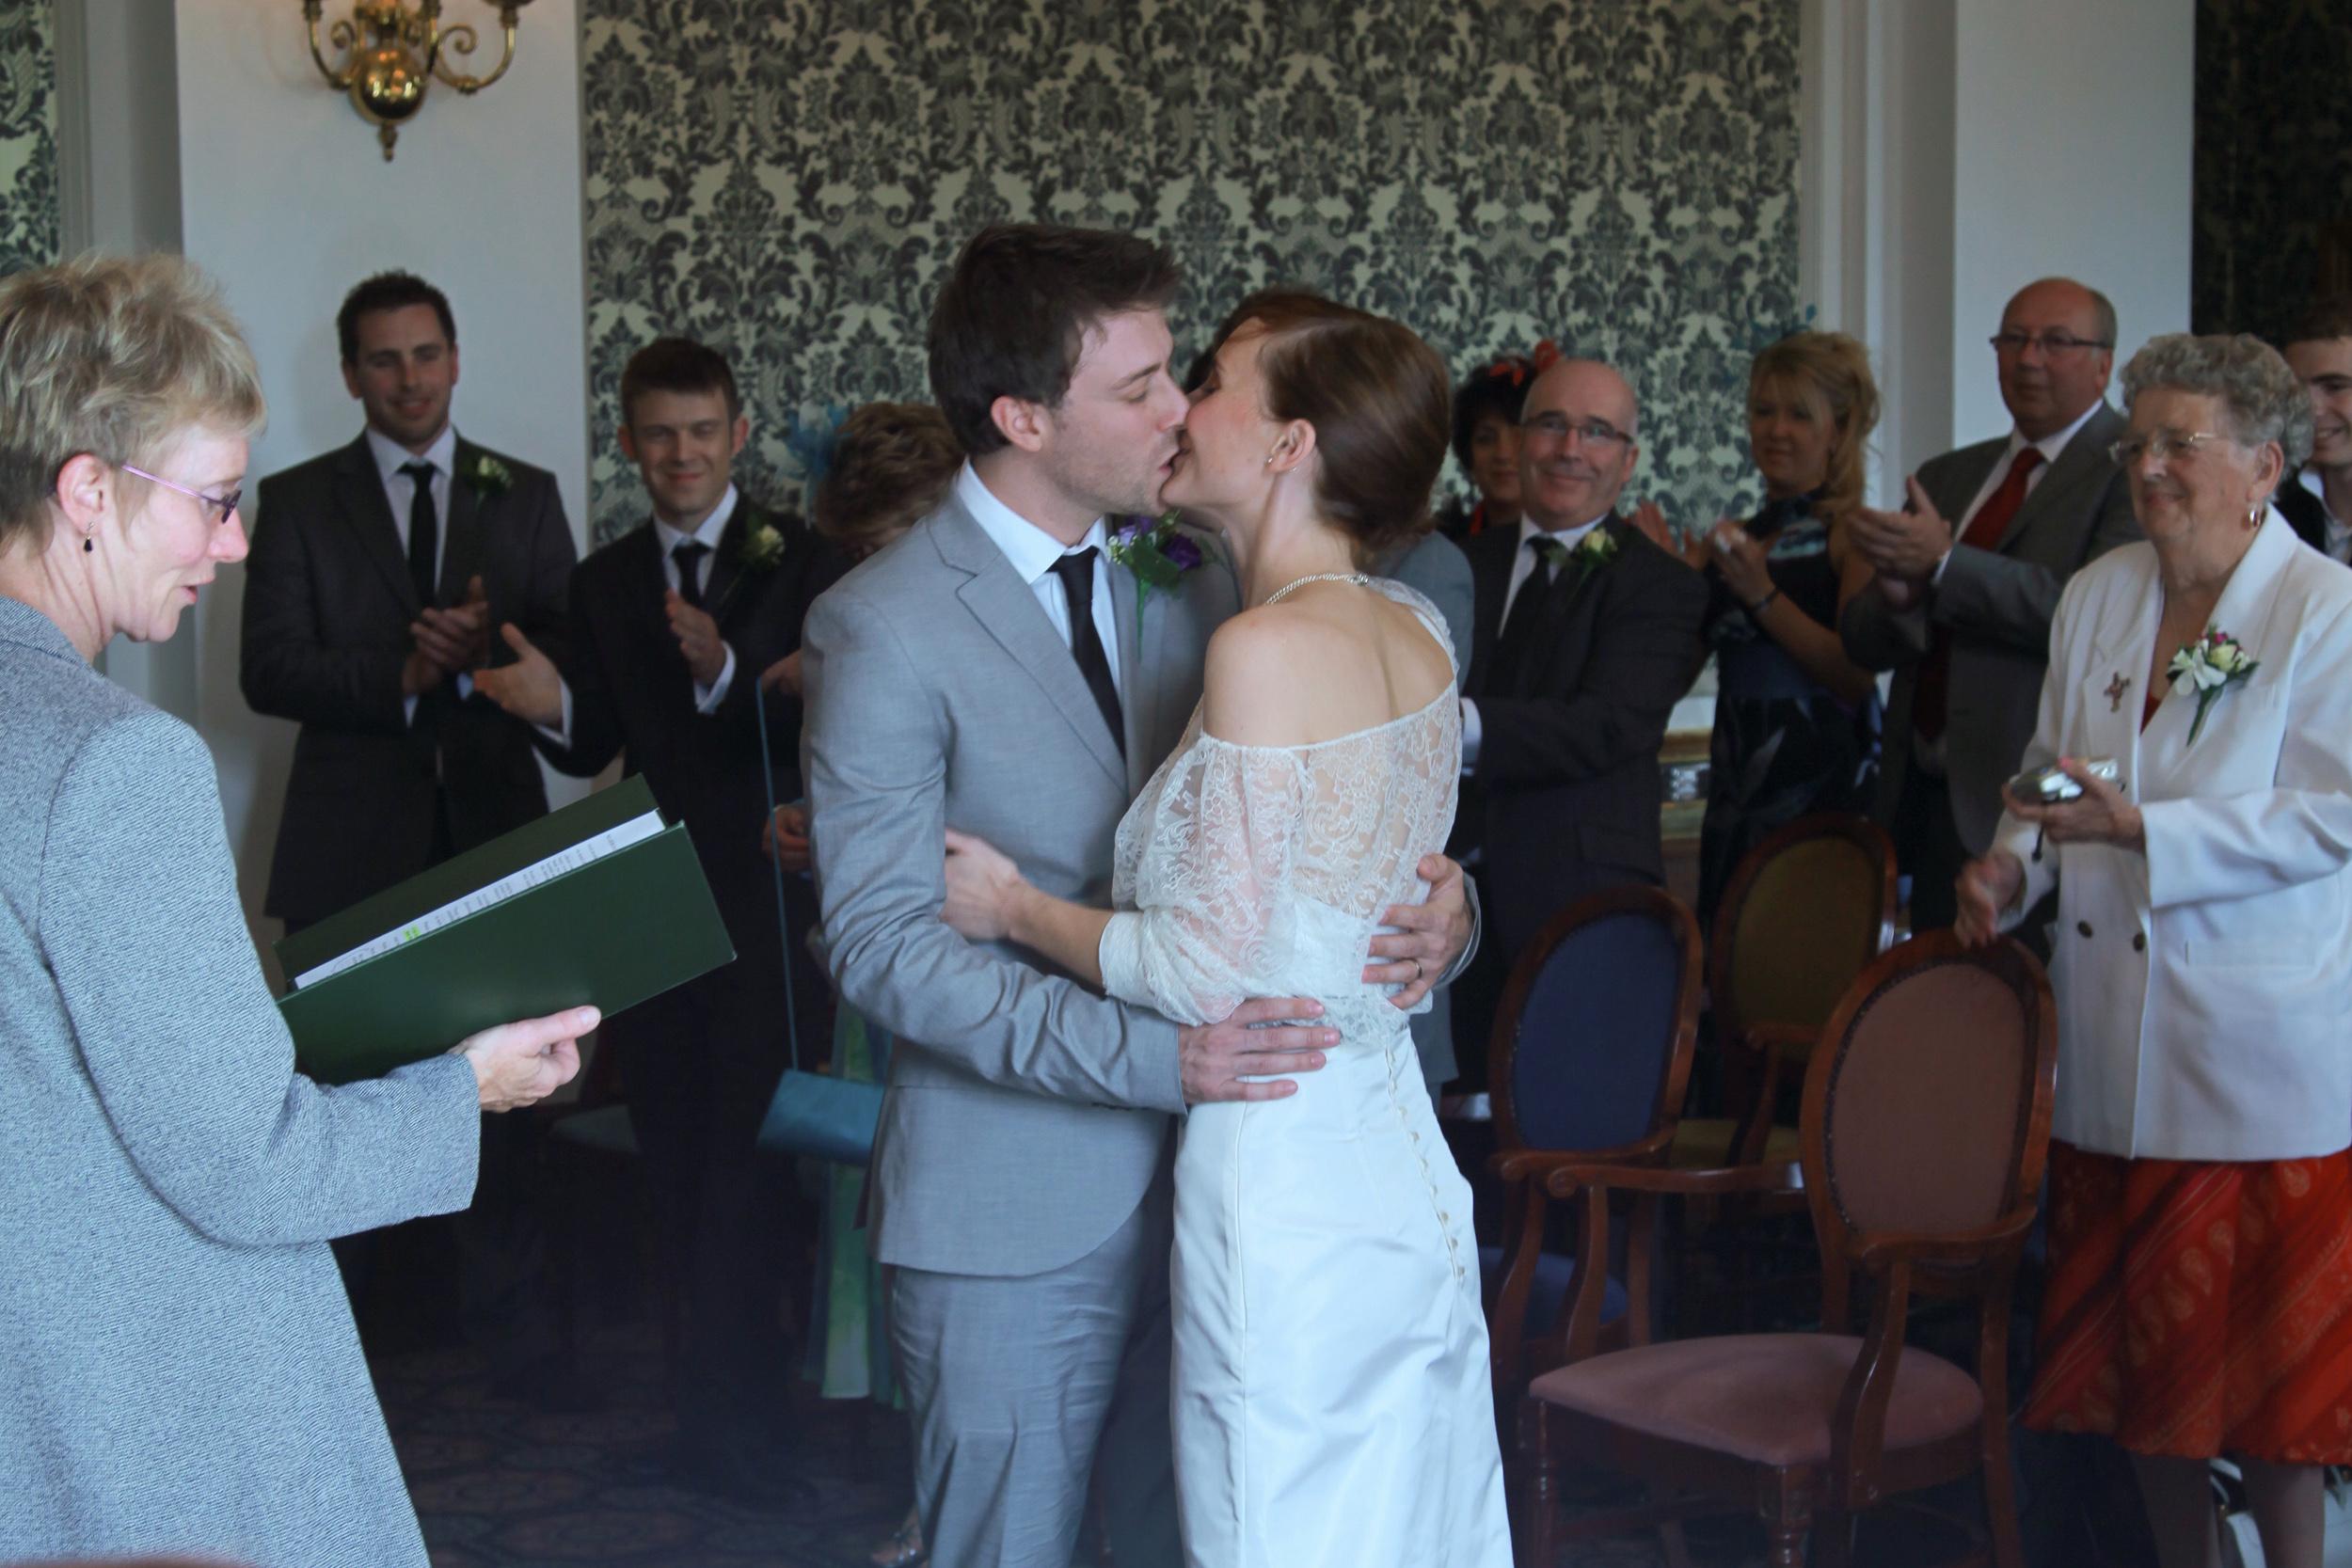 Alexandra-bespoke-wedding-dress-Kate-Beaumont-7.jpg